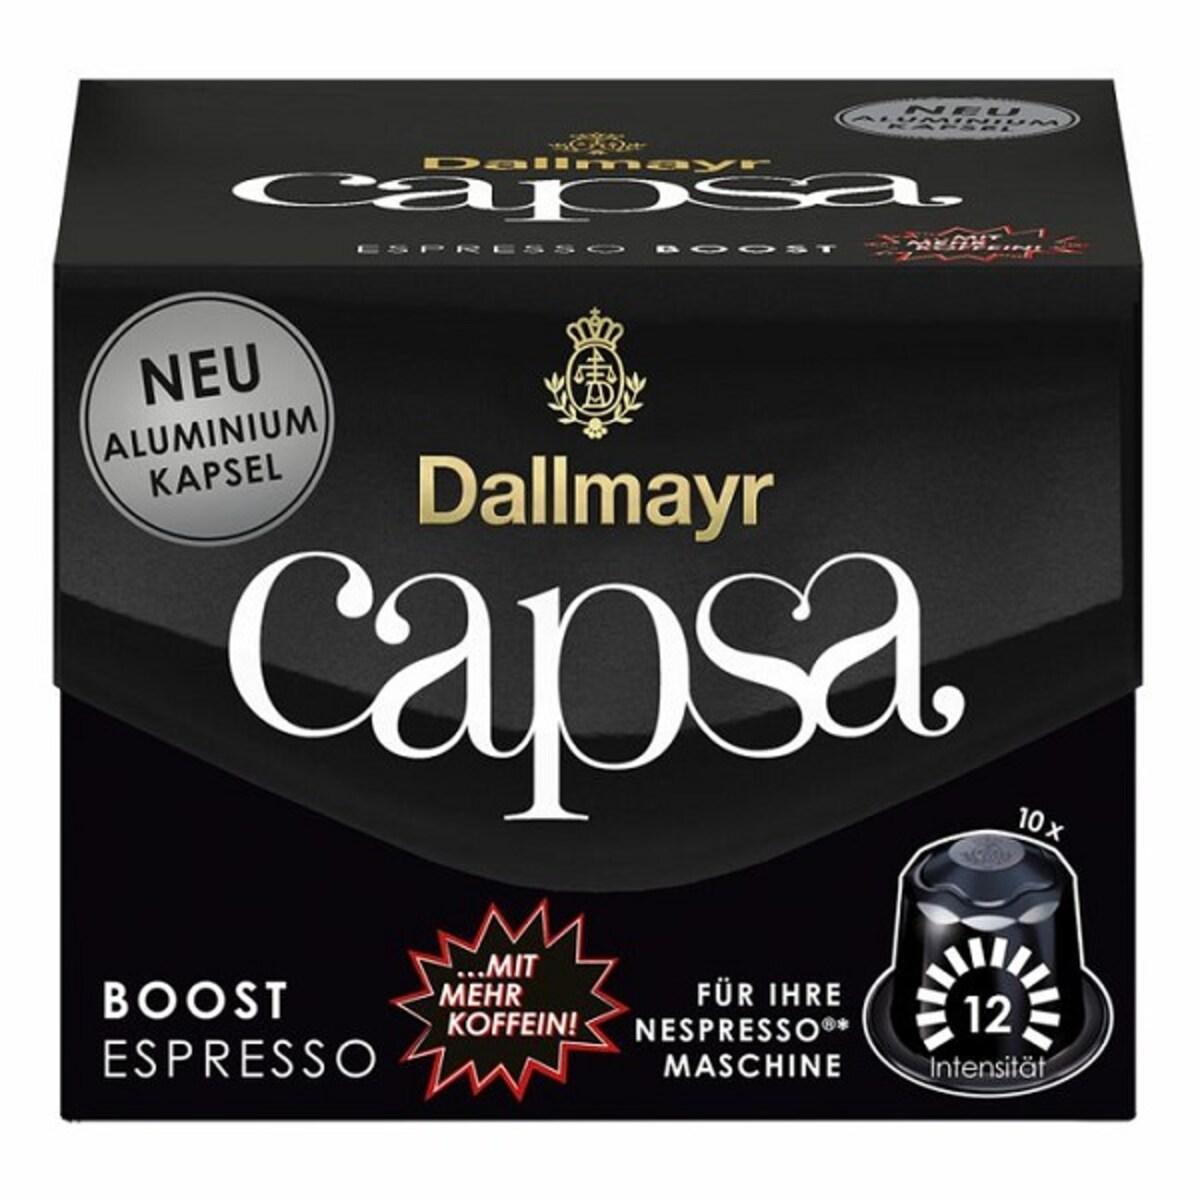 Dallmayr capsa Espresso Boost  Nespresso съвместими капсули